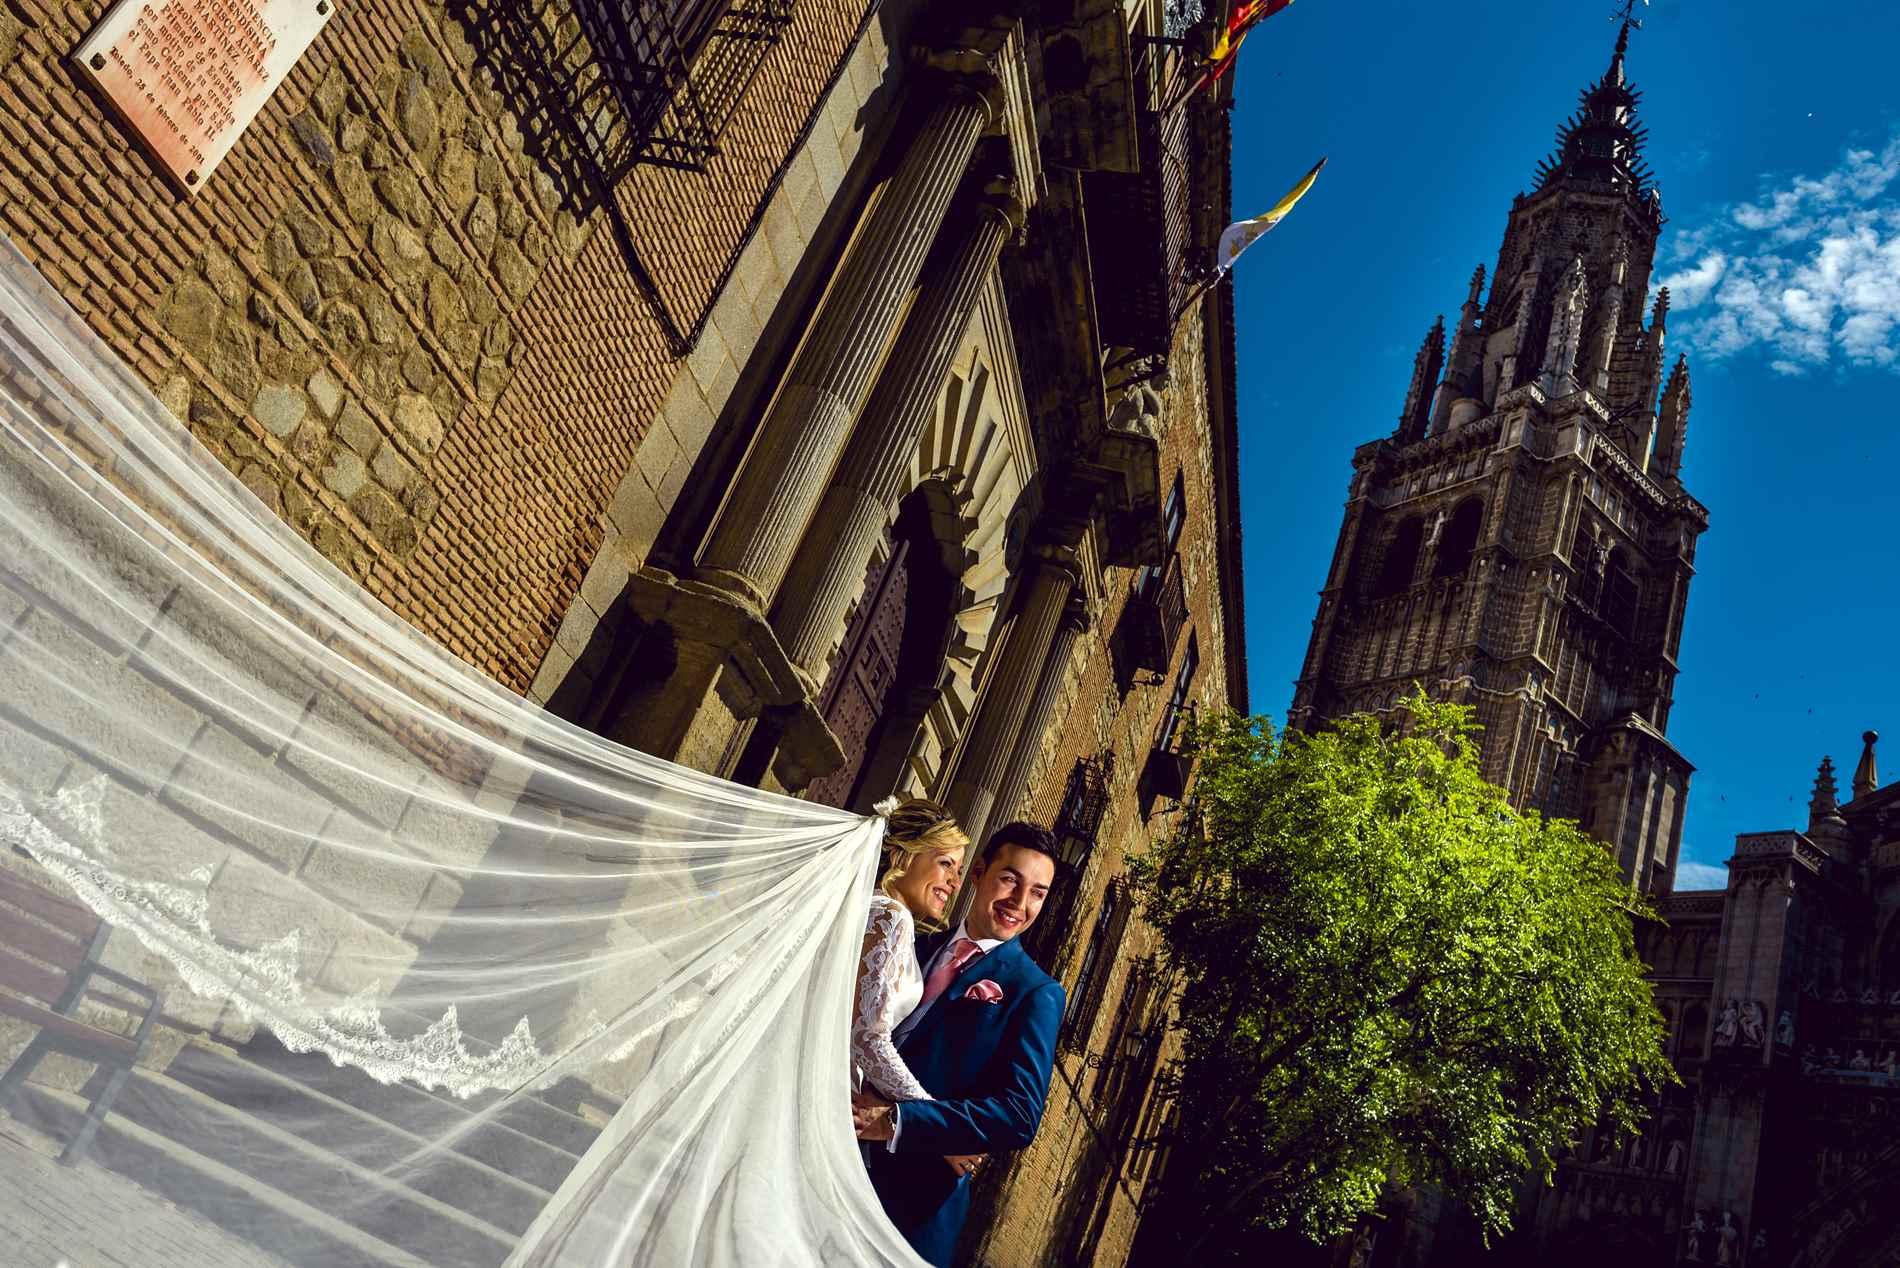 foto postboda en Toledo - La Catedral de Toledo